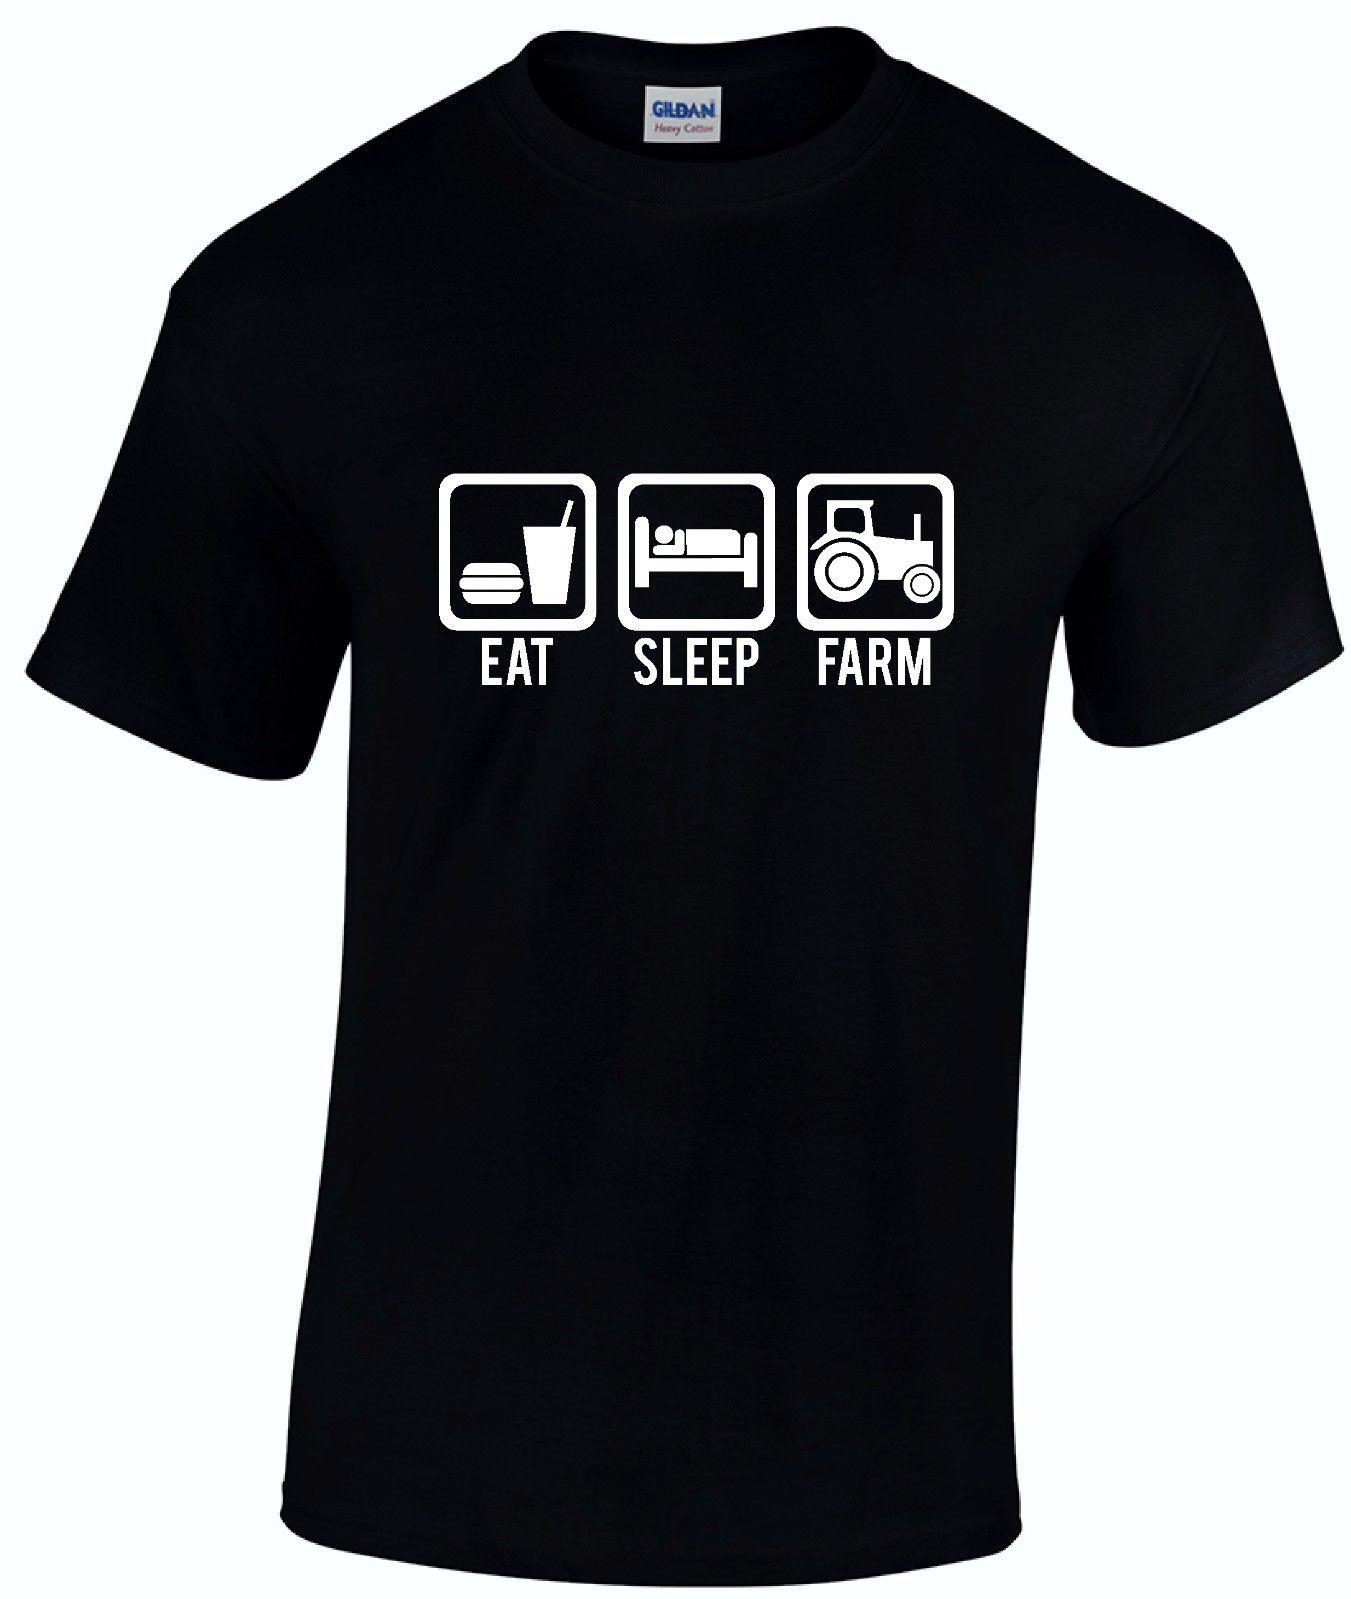 38058e156892d Eat Sleep Farm Tshirt - Farmer Farming Tractor Kids Gift Mens Unisex  T-shirt New T Shirts Funny Tops Tee New Unisex Funny Tops